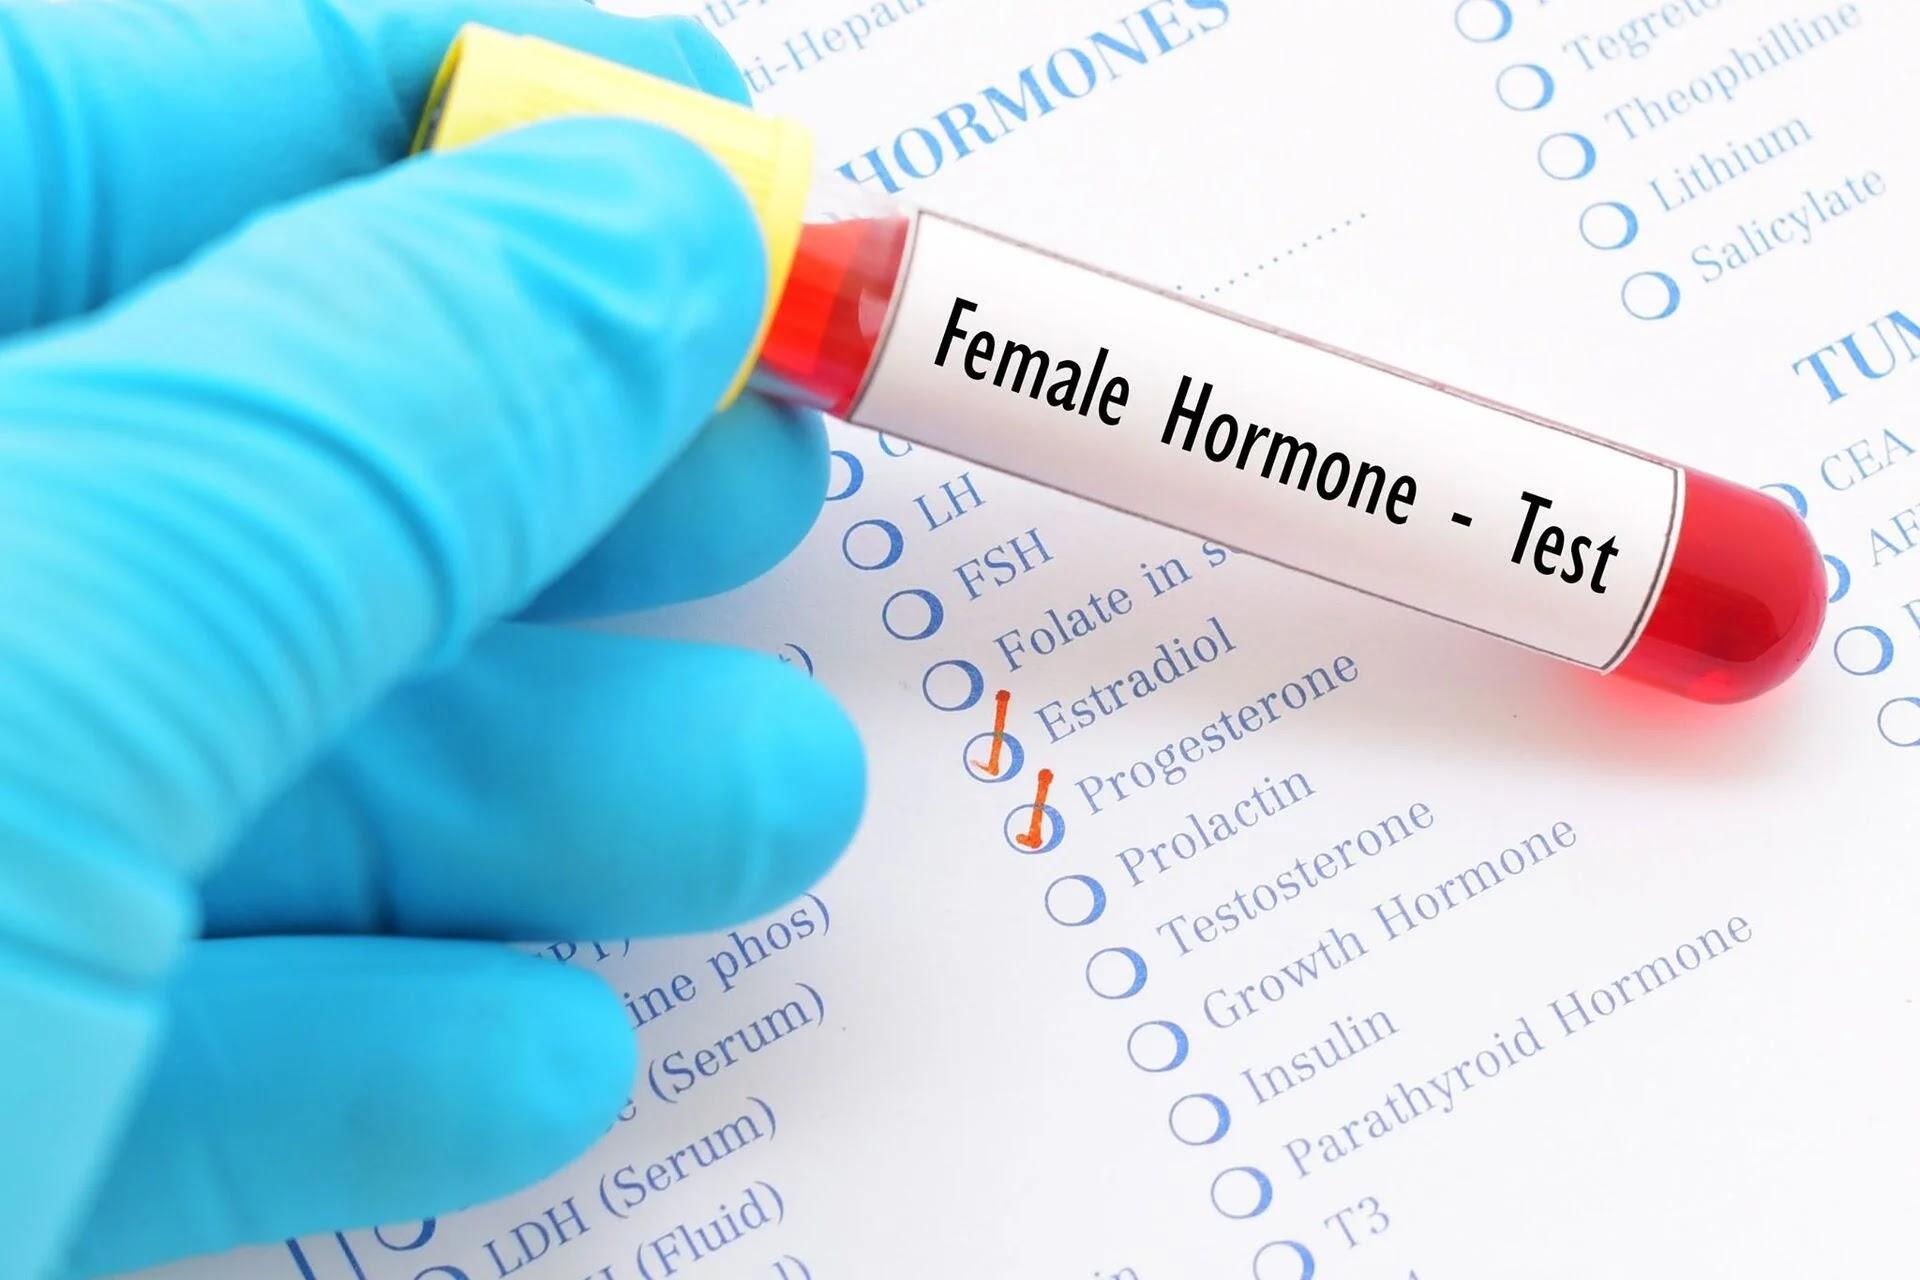 Makanan-makanan Yang Membantu Menstabilkan Hormon Estrogen dan Progesteron